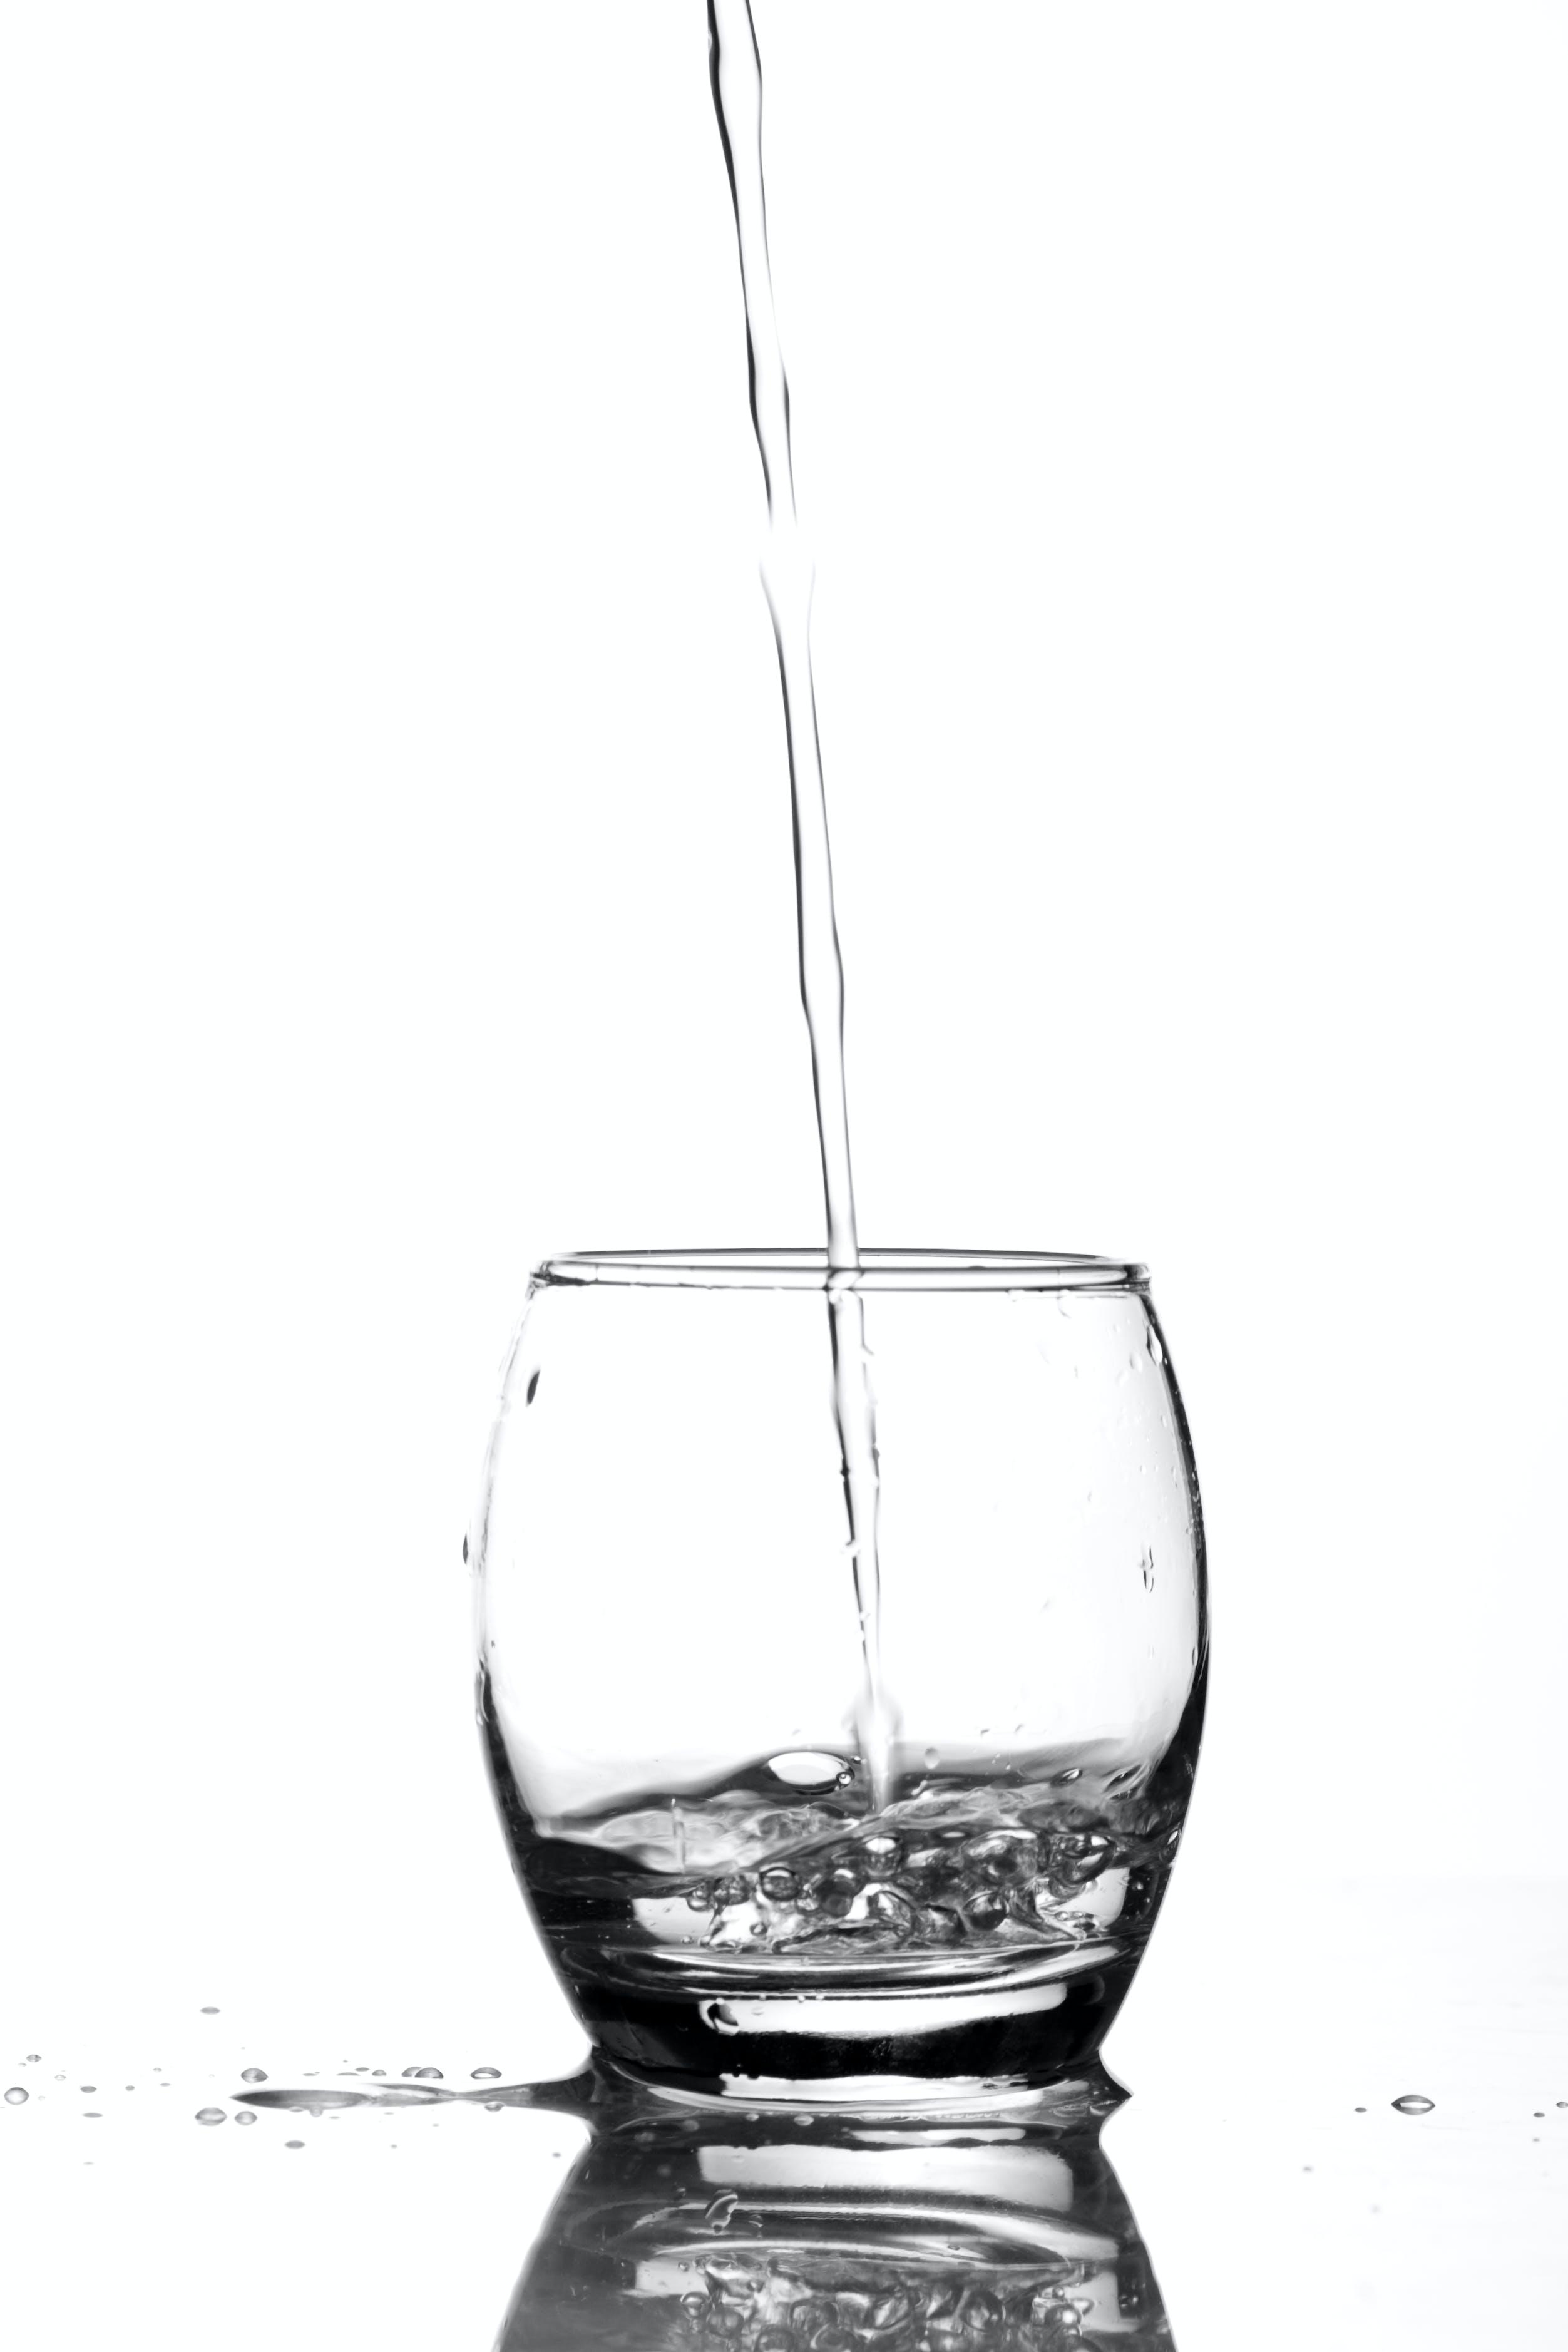 água, bebida, claro